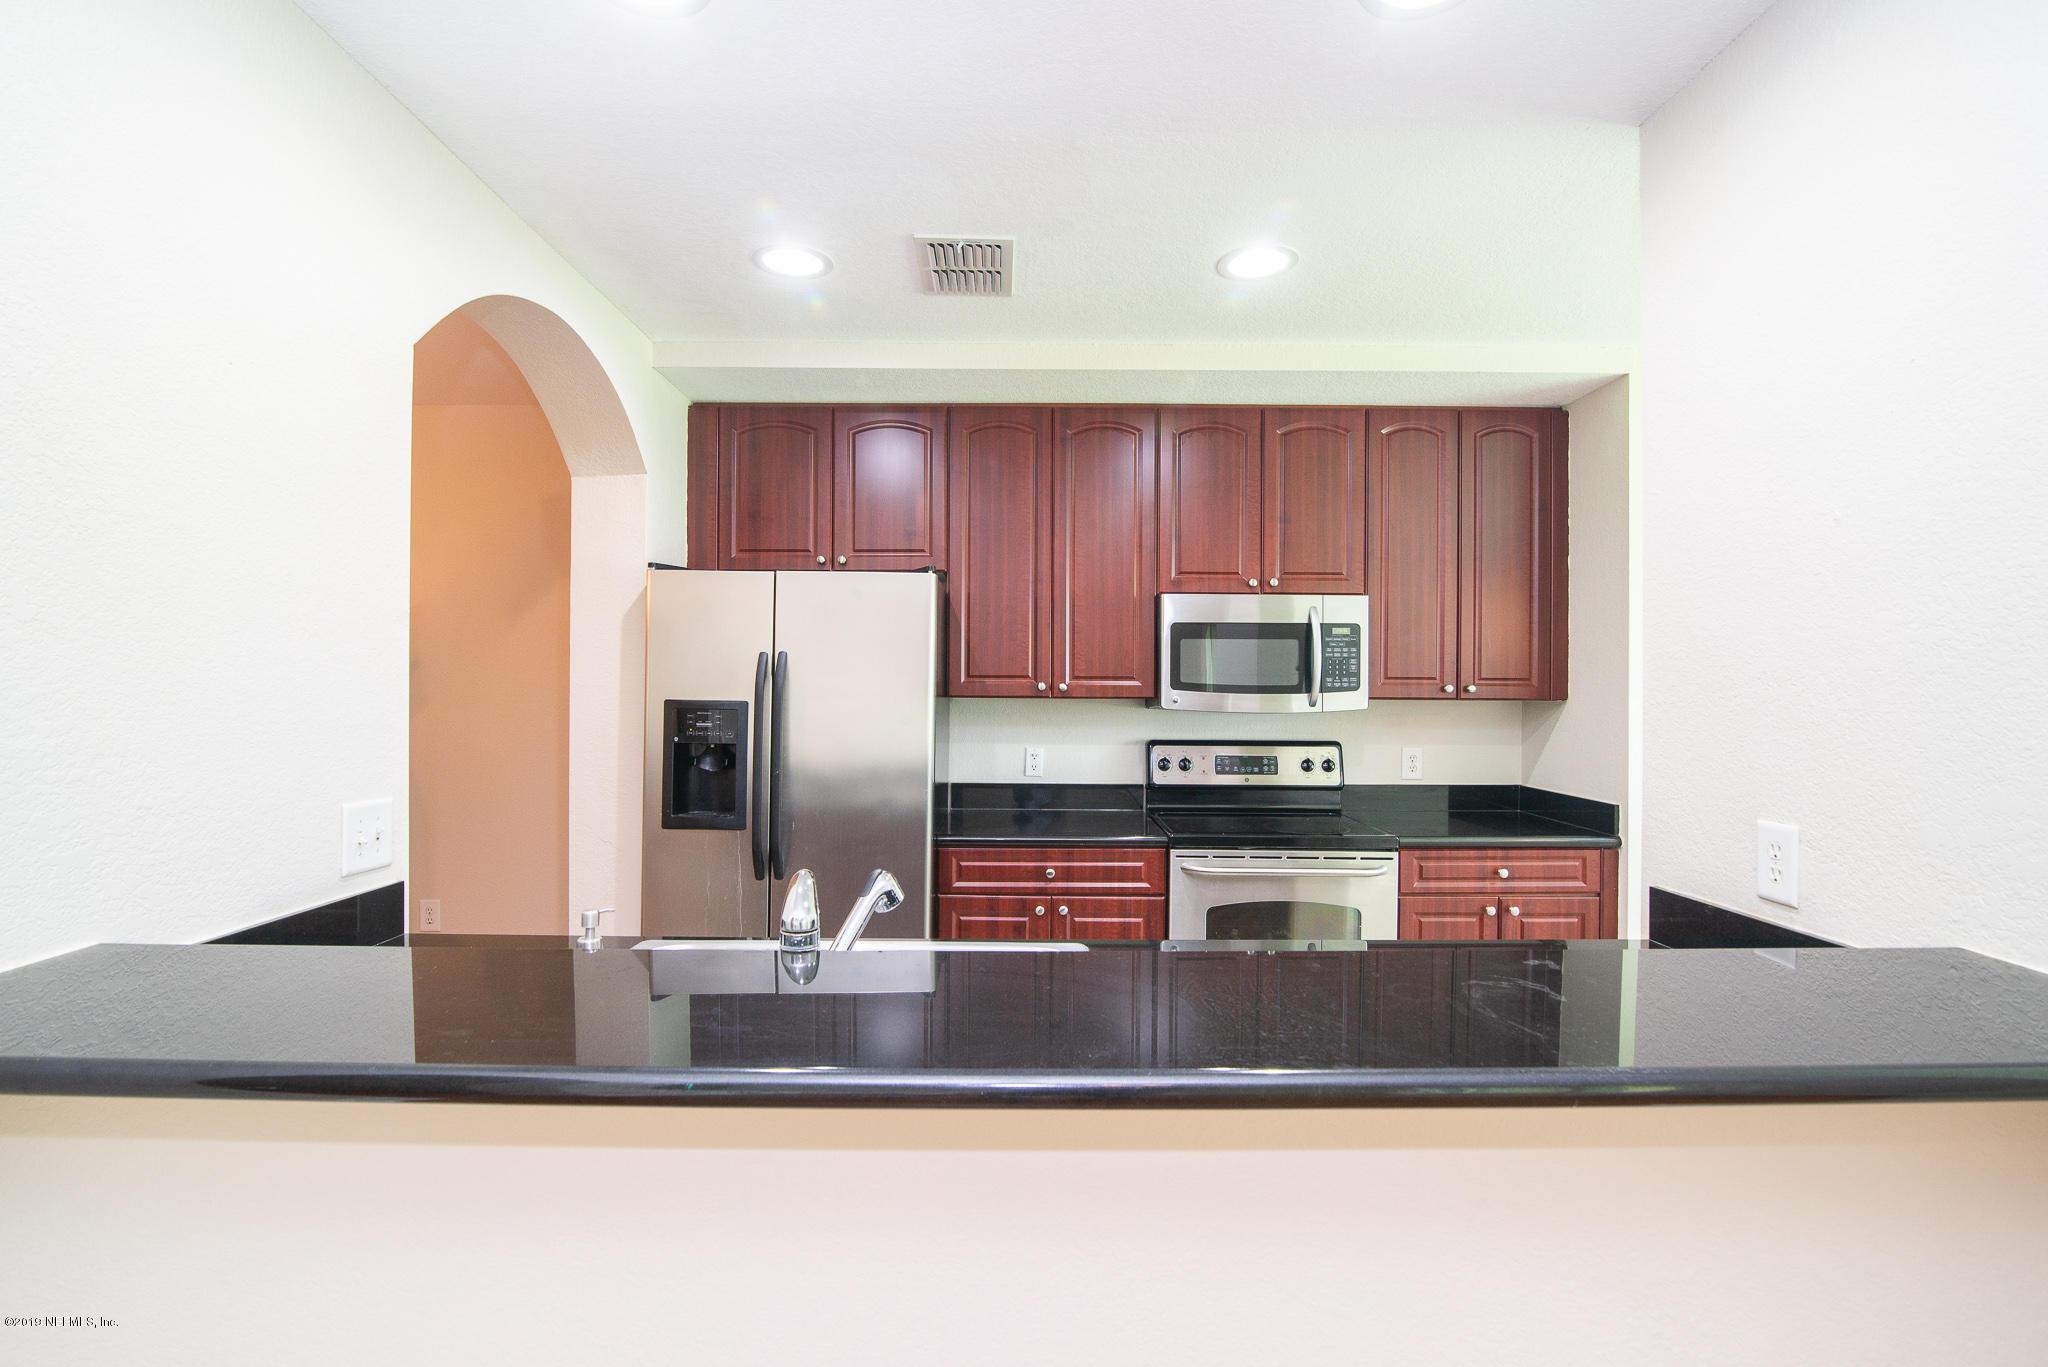 9745 TOUCHTON, JACKSONVILLE, FLORIDA 32246, 3 Bedrooms Bedrooms, ,2 BathroomsBathrooms,Condo,For sale,TOUCHTON,1015444